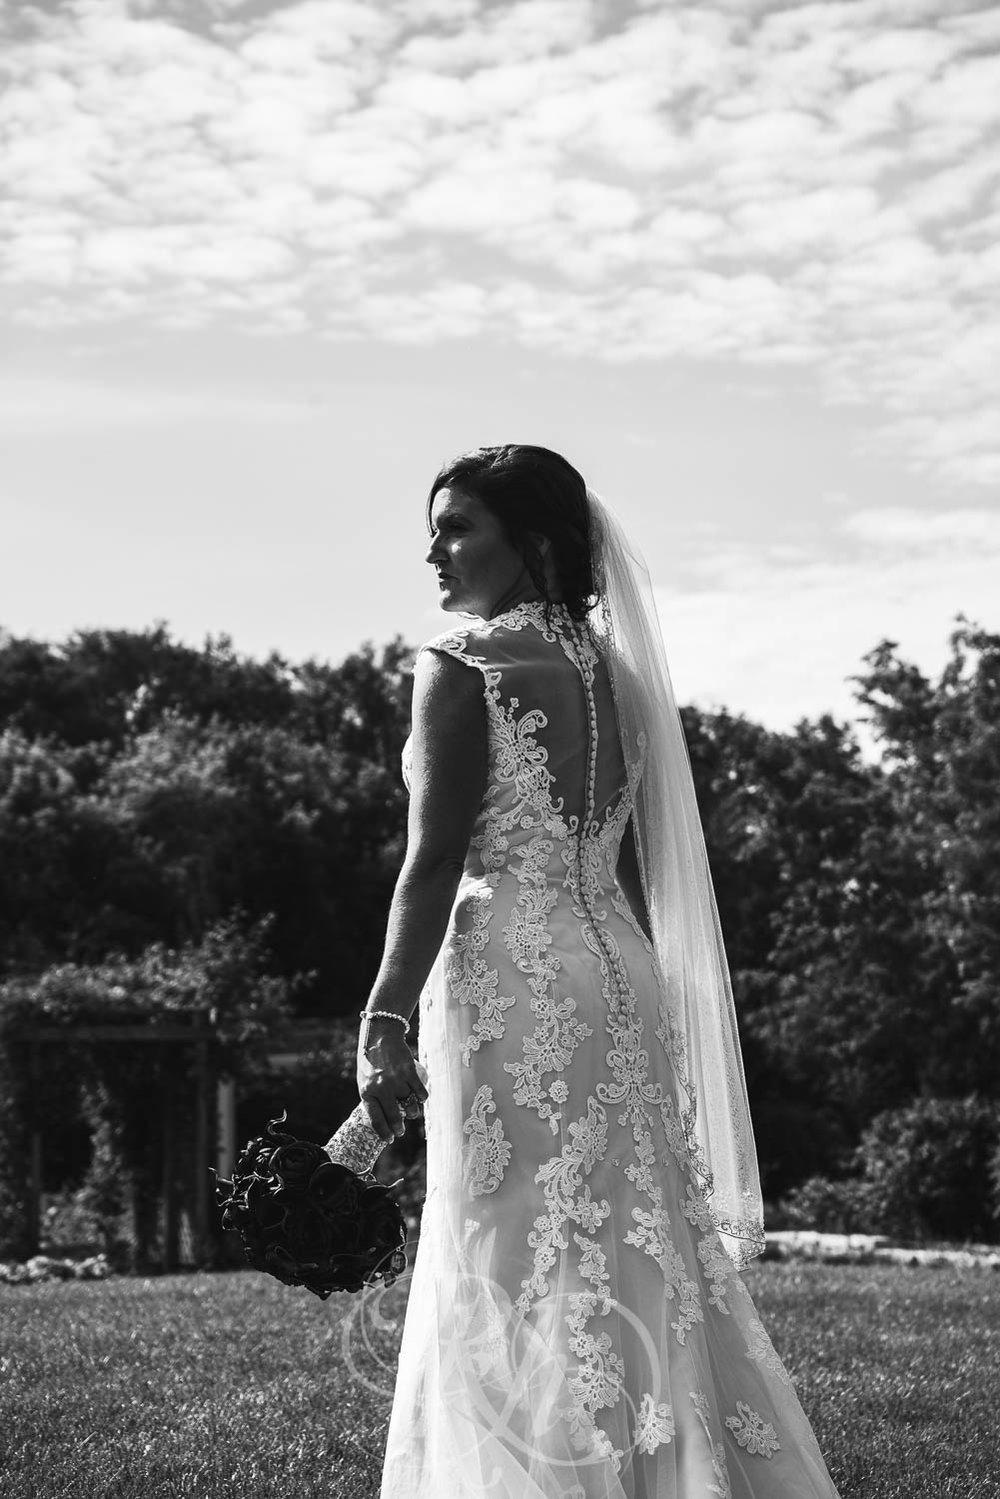 Lindsey & Jeremy - Minnesota Wedding Photography - RKH Images - Blog (15 of 52).jpg